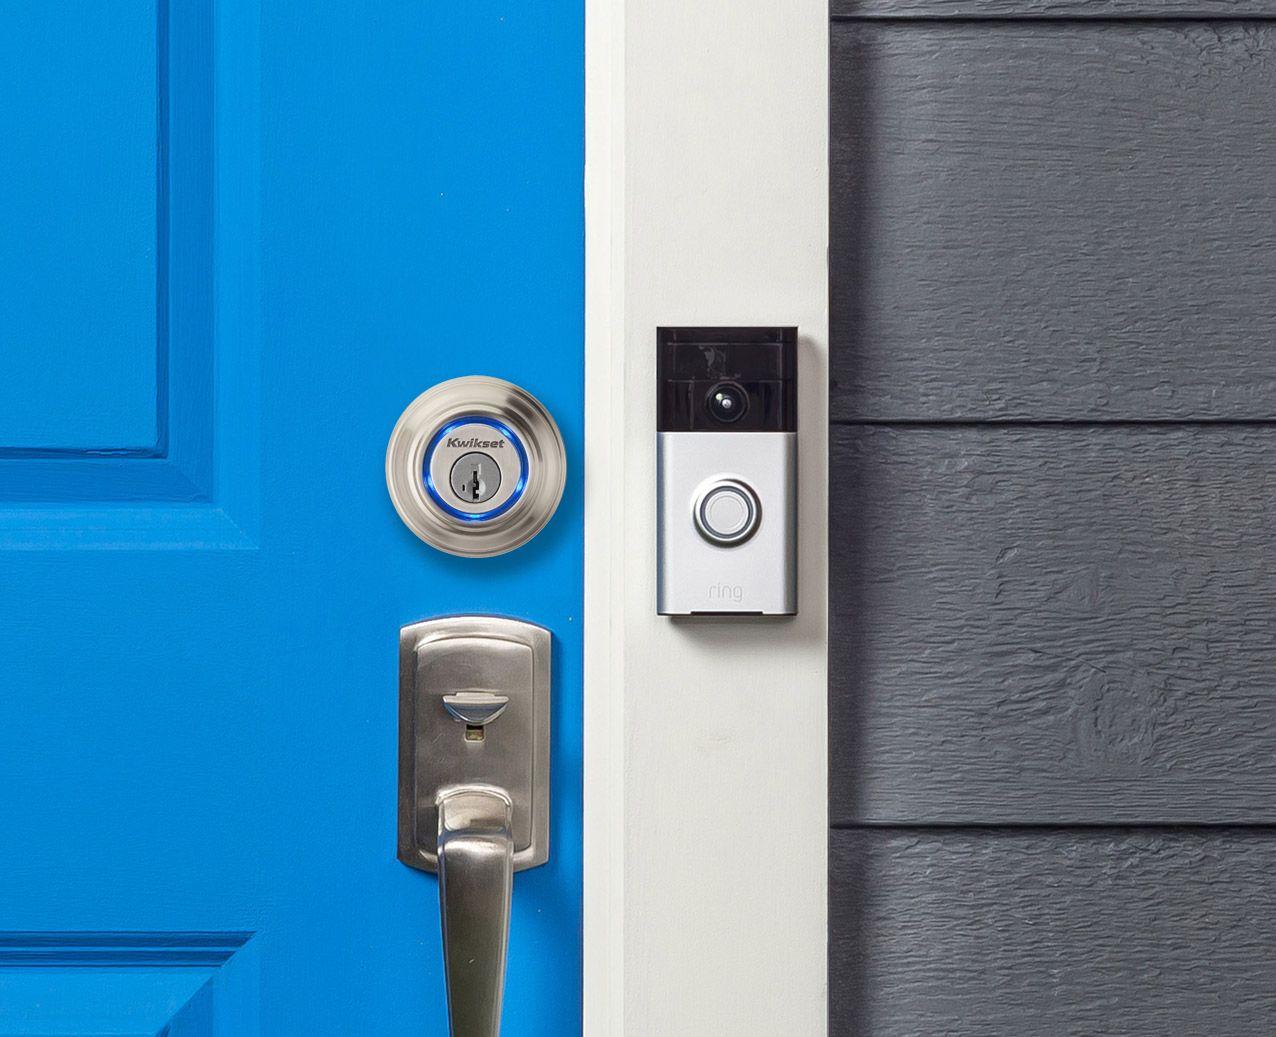 Kevo Lock & Ring Video Doorbell – Front Door Camera | Kwikset Kevo ...